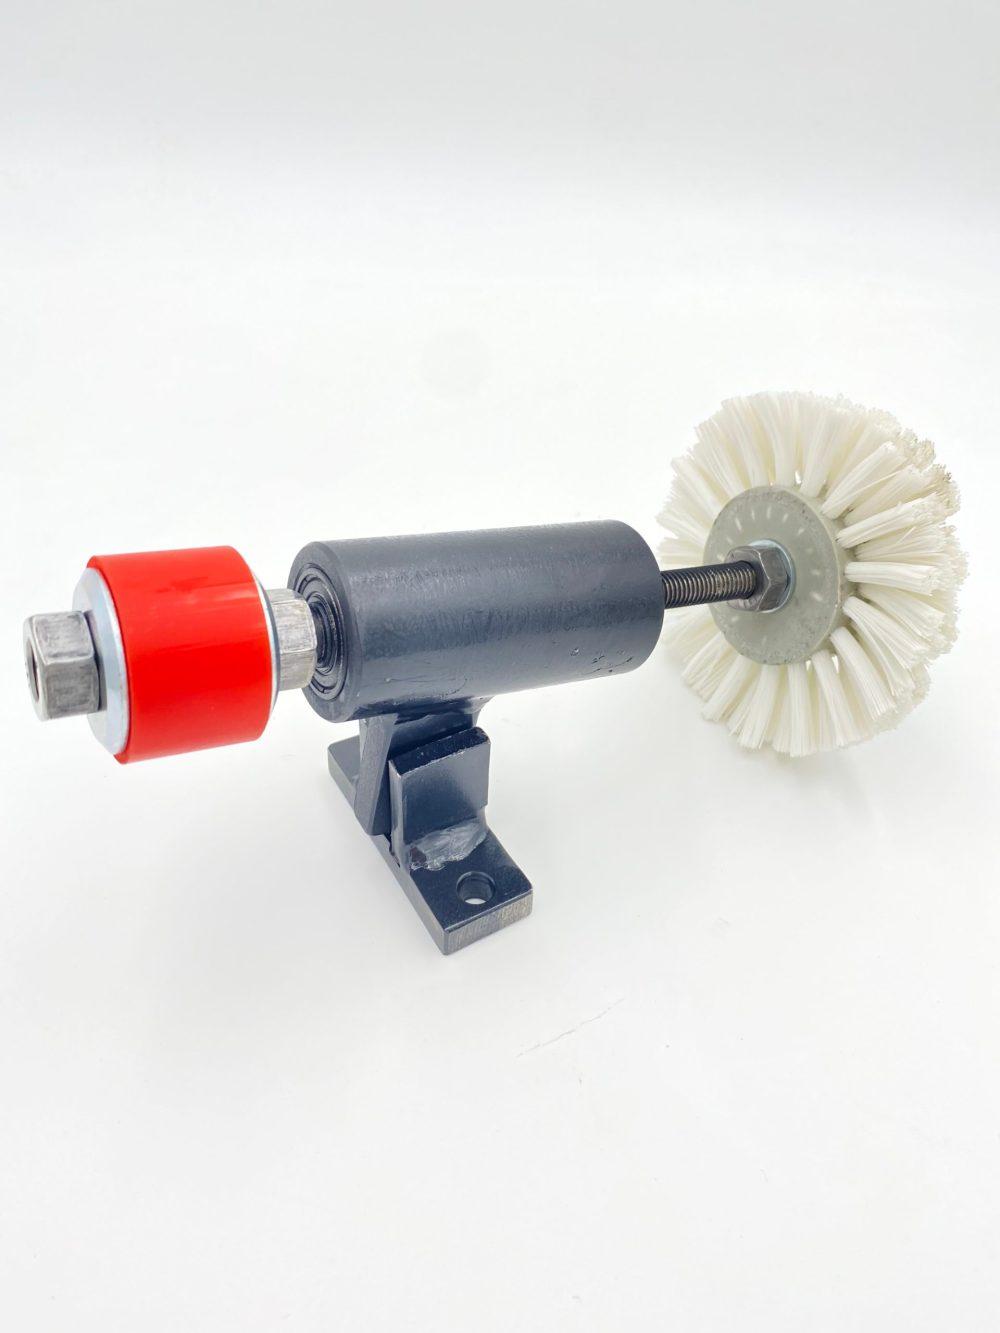 Chip Brush Assembly for RMT Bandsaws - RMTPM0130